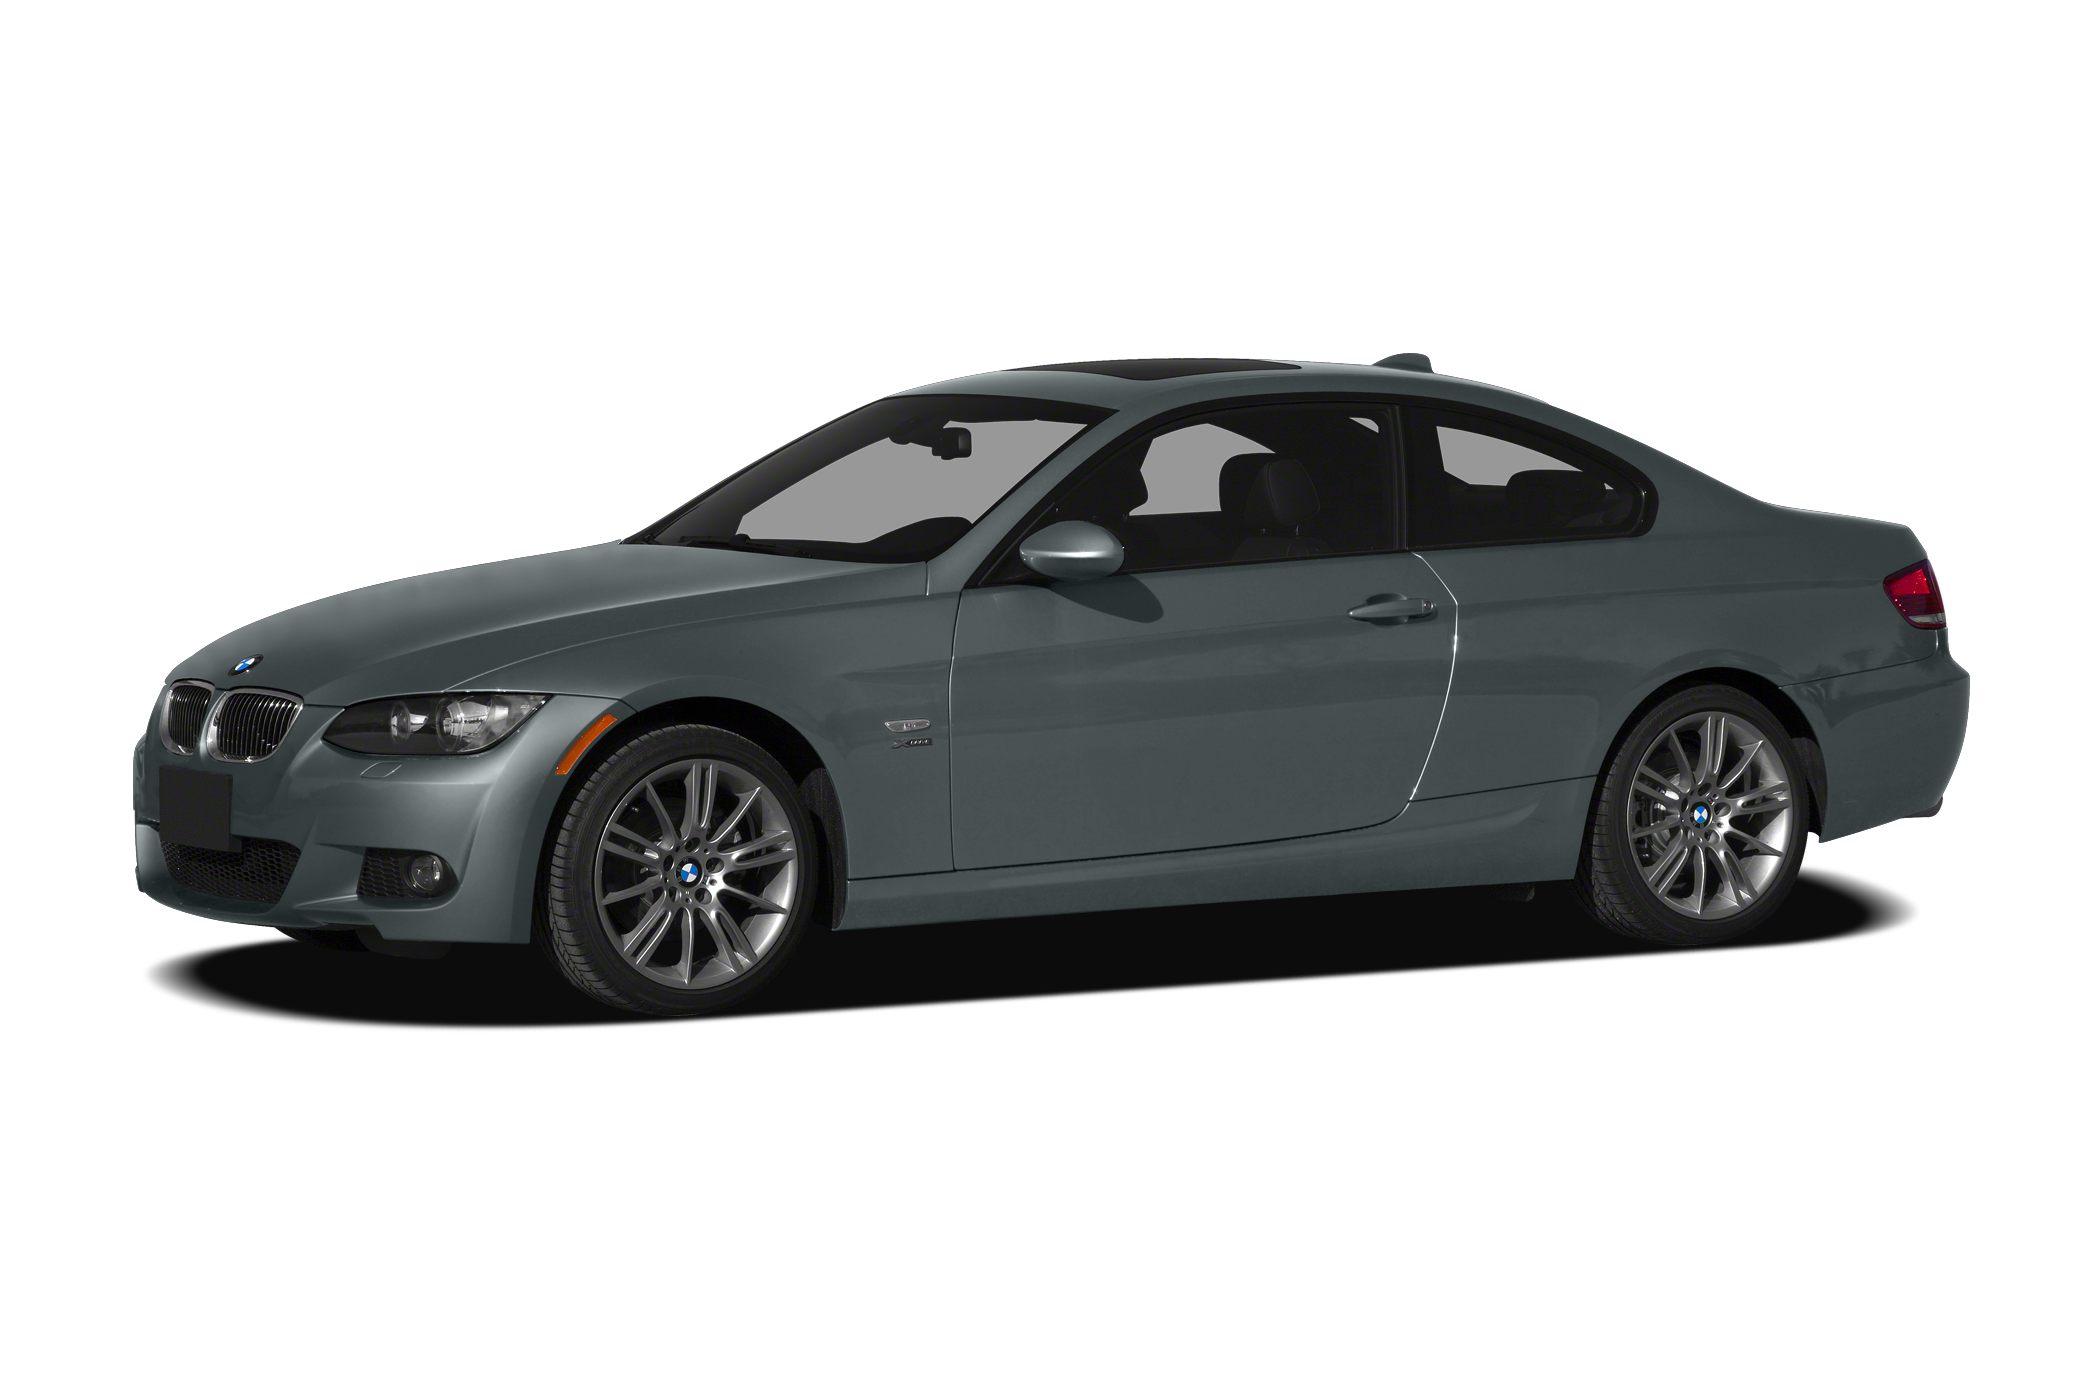 2010 BMW 328 I Sedan for sale in Shreveport for $0 with 82,390 miles